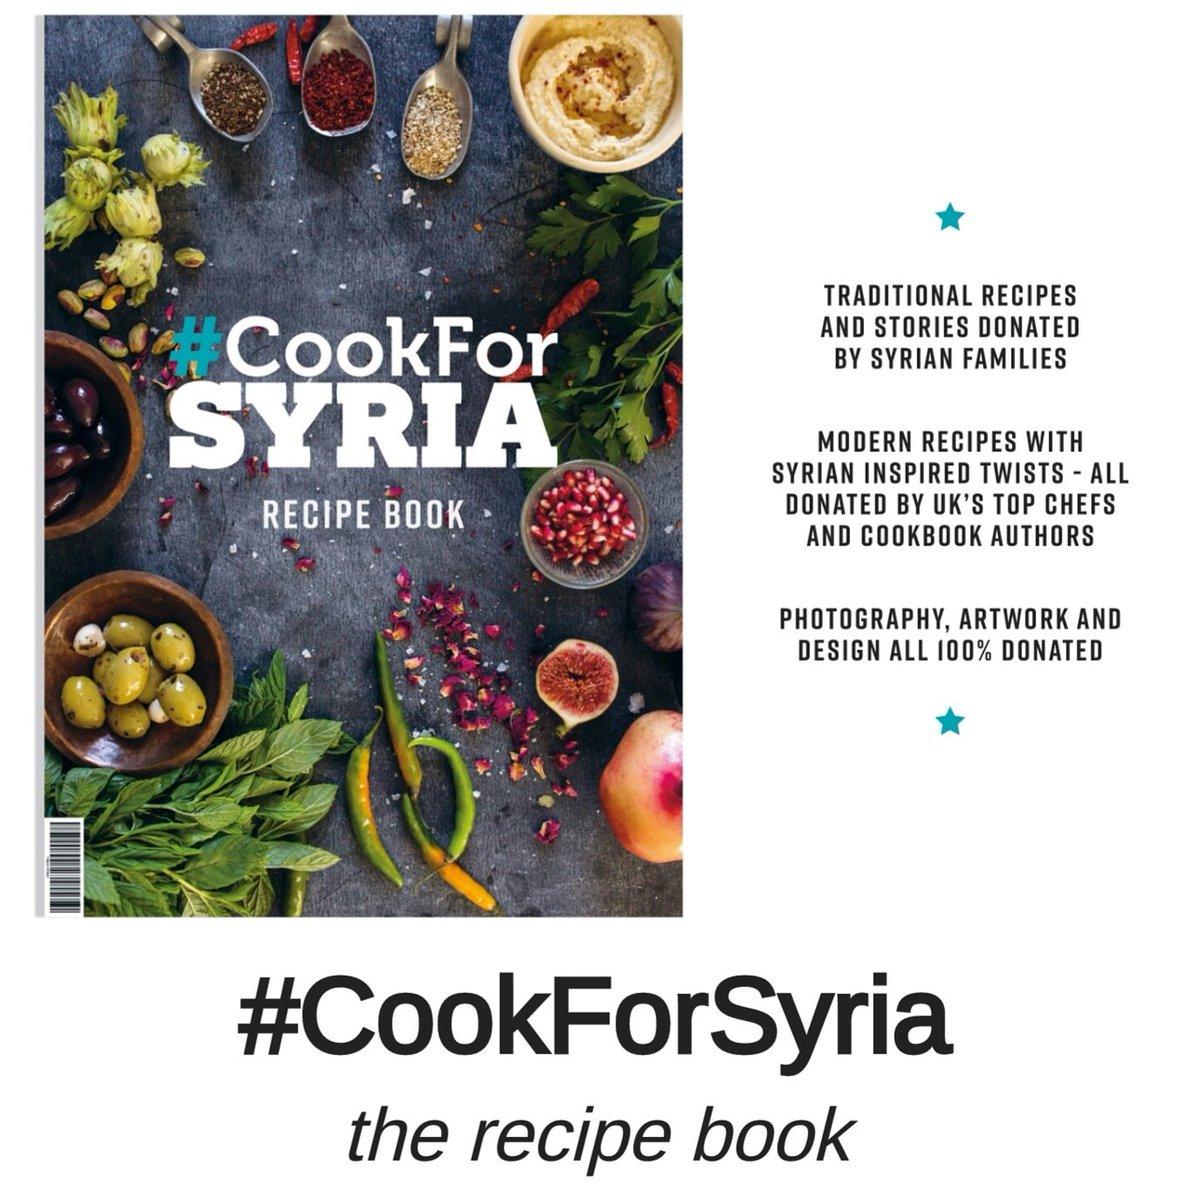 Cookforsyria cookforsyria twitter forumfinder Images